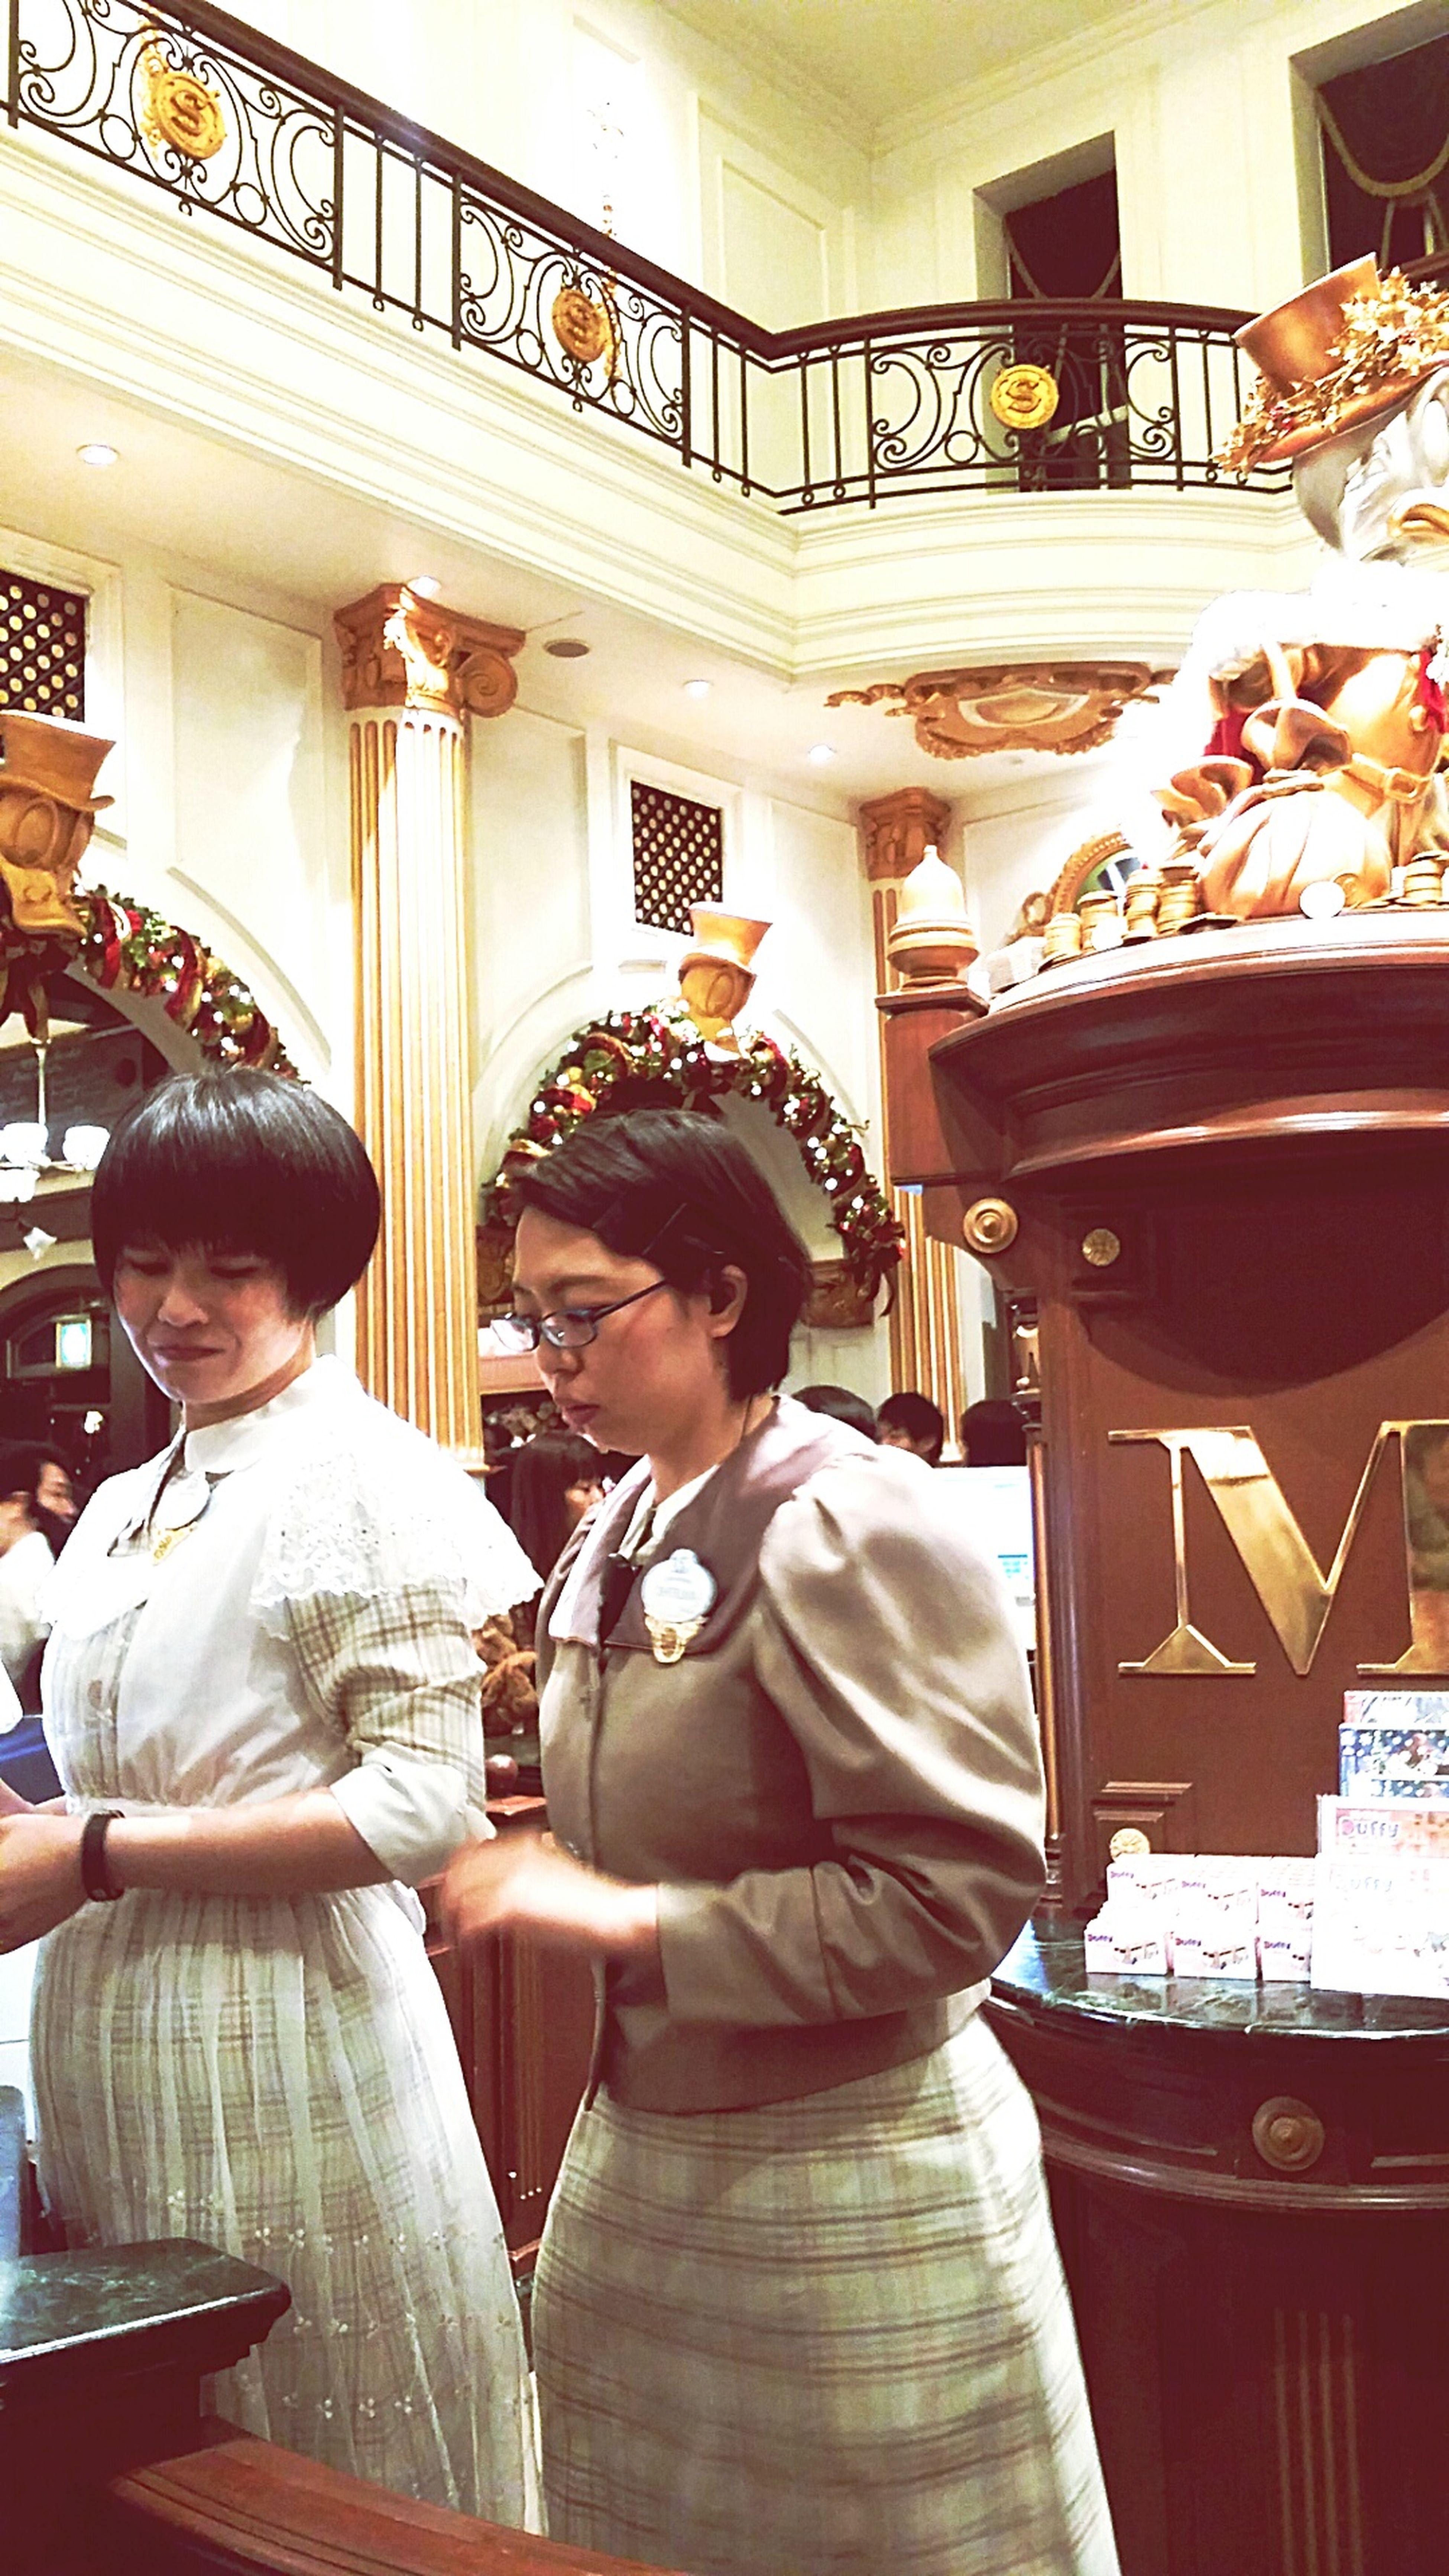 Disney Staff Costume Period Costume Tokyostreetphotography Japanstreetphotography Streetphotography Tokyo Japan Tokyodisneysea DisneySea TokyoDec2016 JapanDec2016